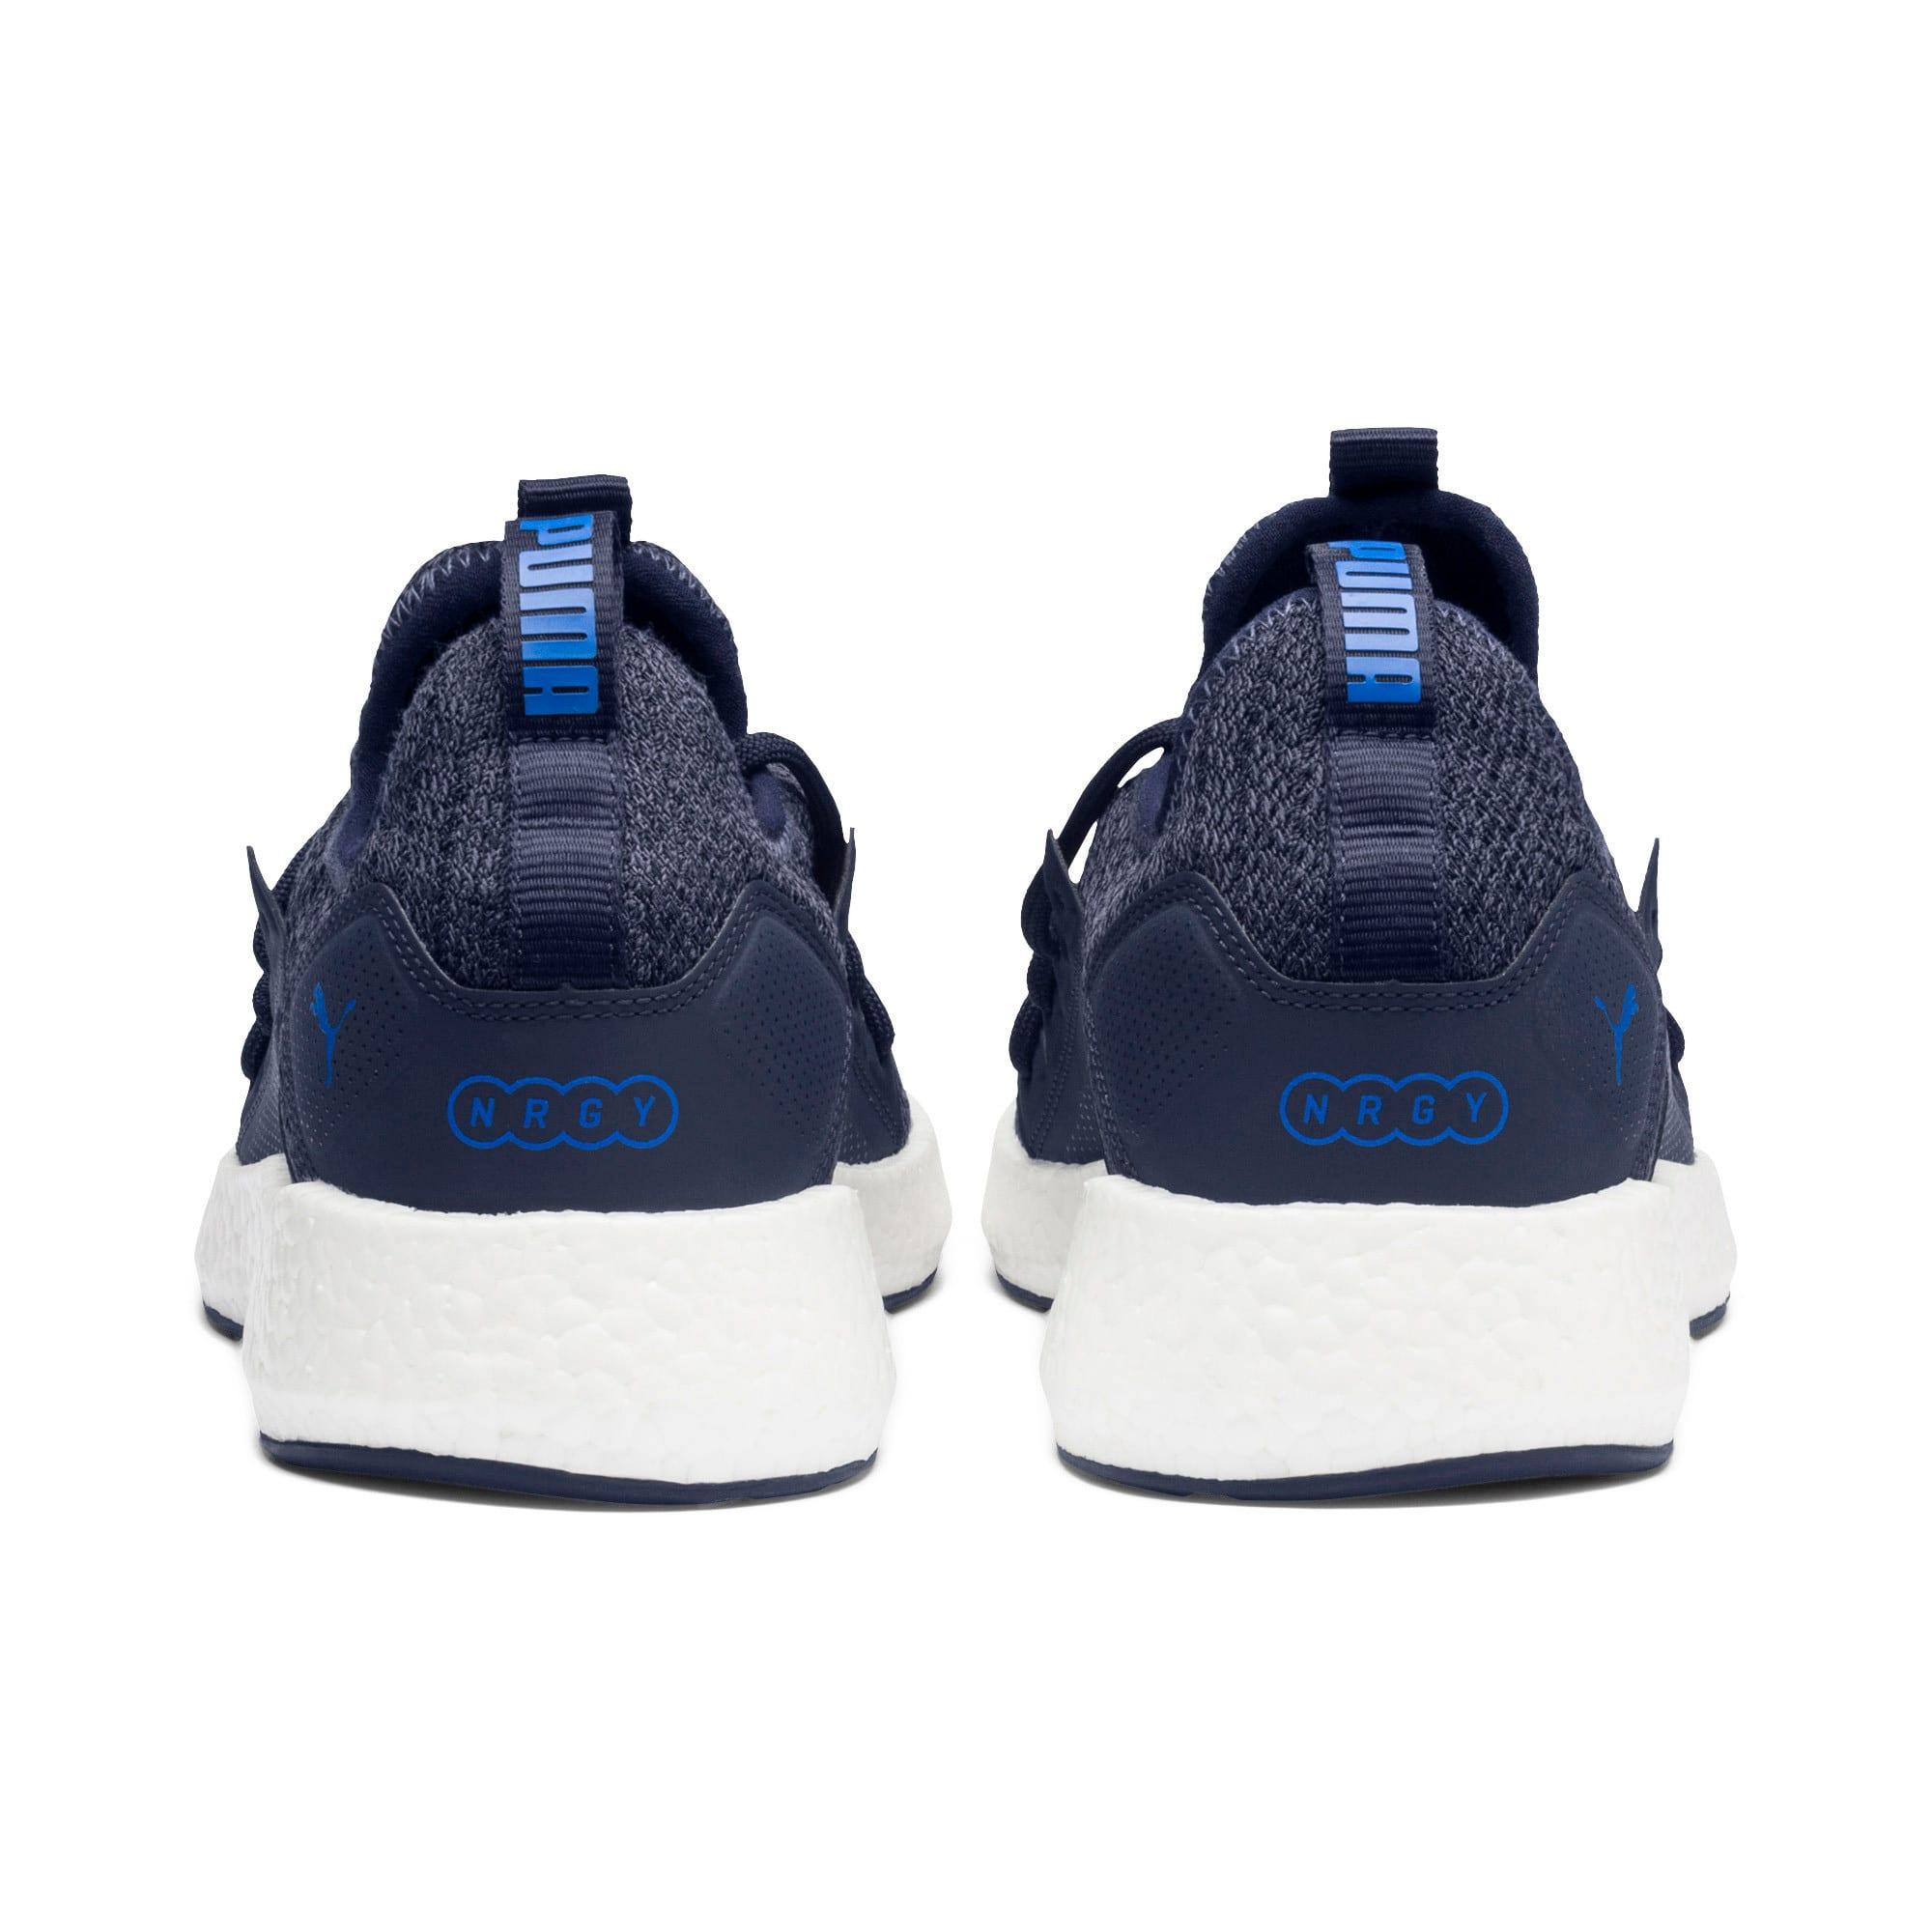 Miniatura 4 de Zapatos para correr NRGY Neko Knit para hombre, Peacoat-Strong Blue, mediano